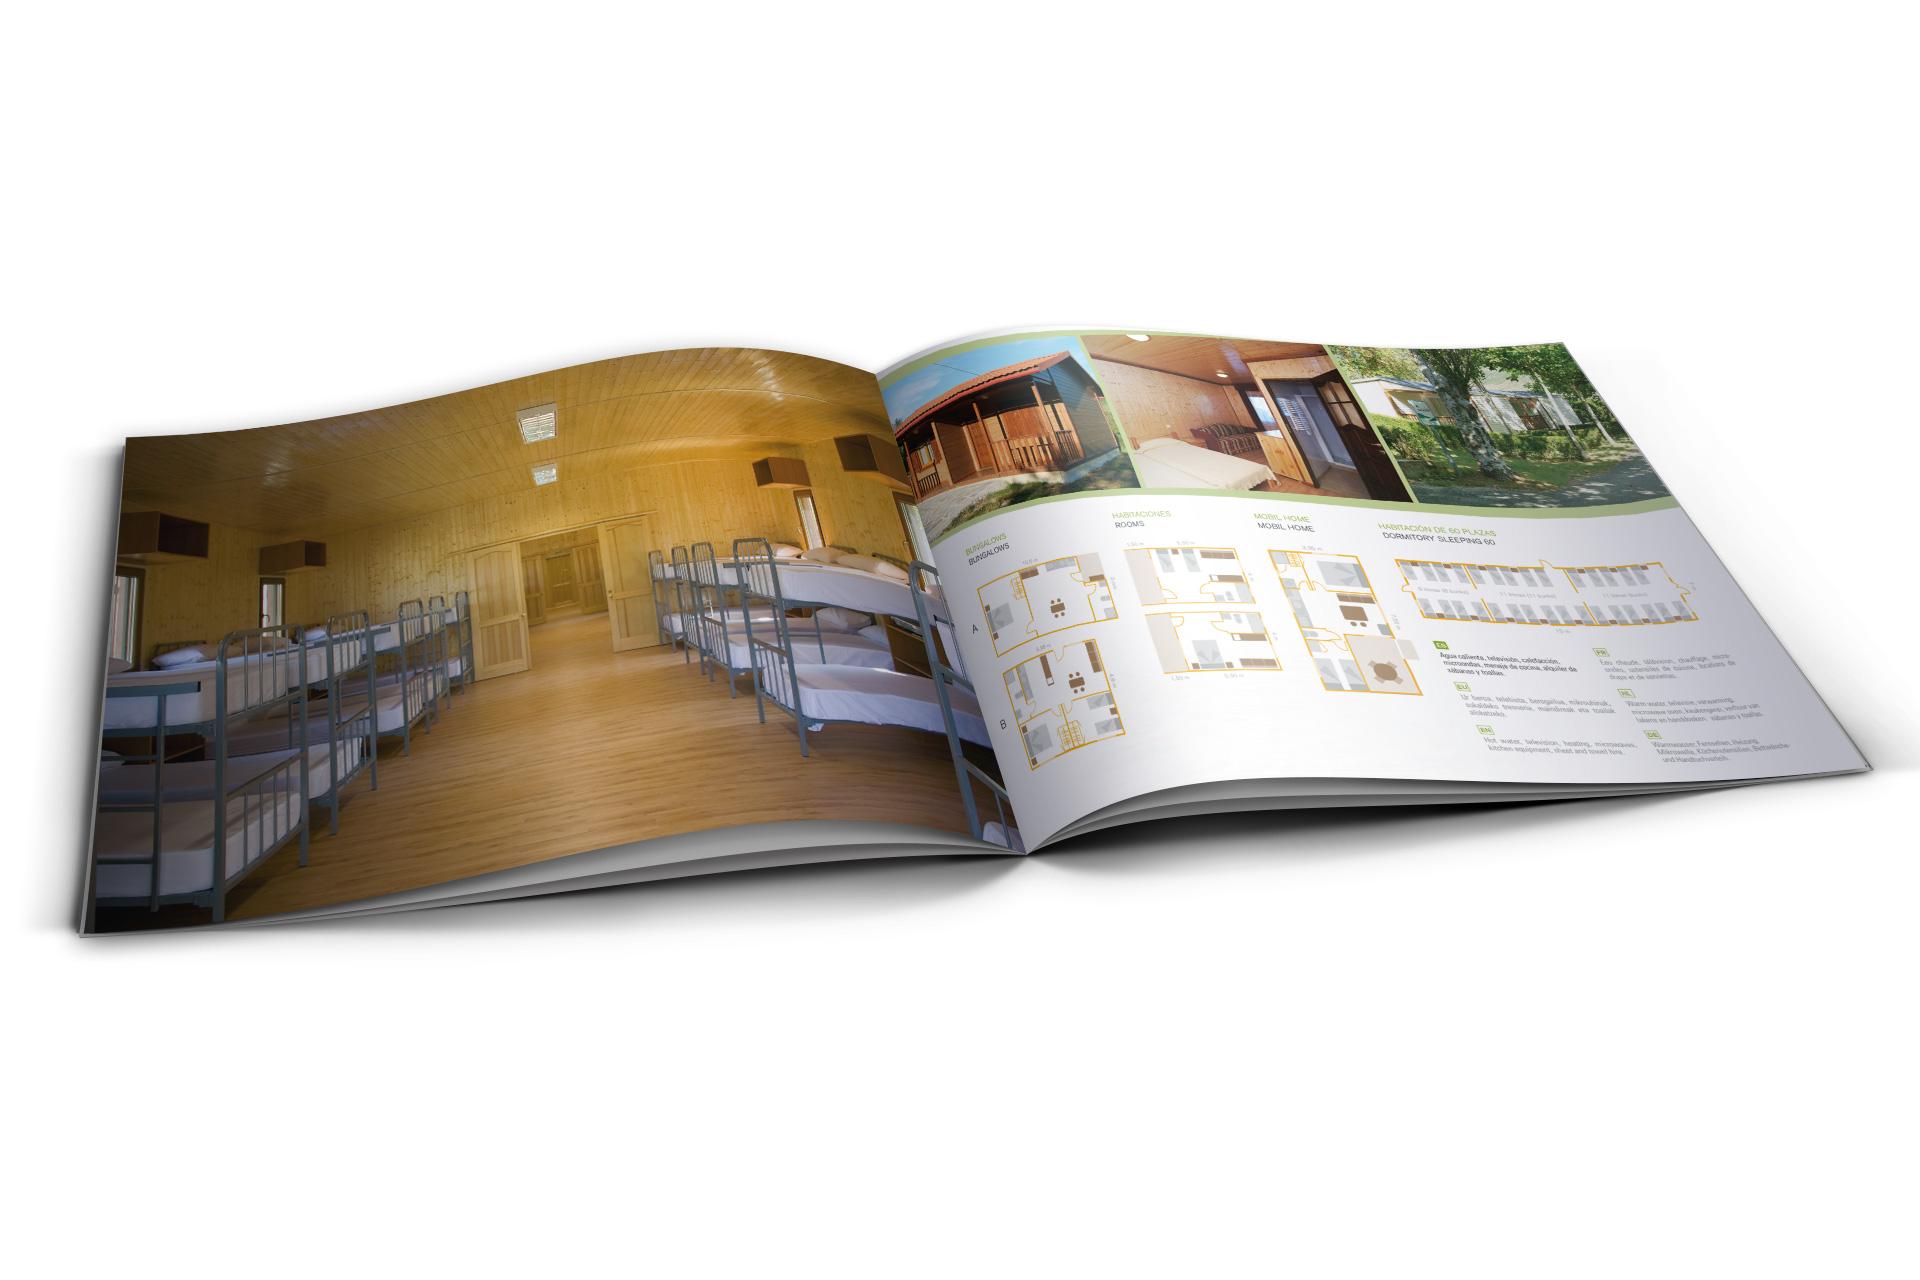 catálogo para camping Ezcaba